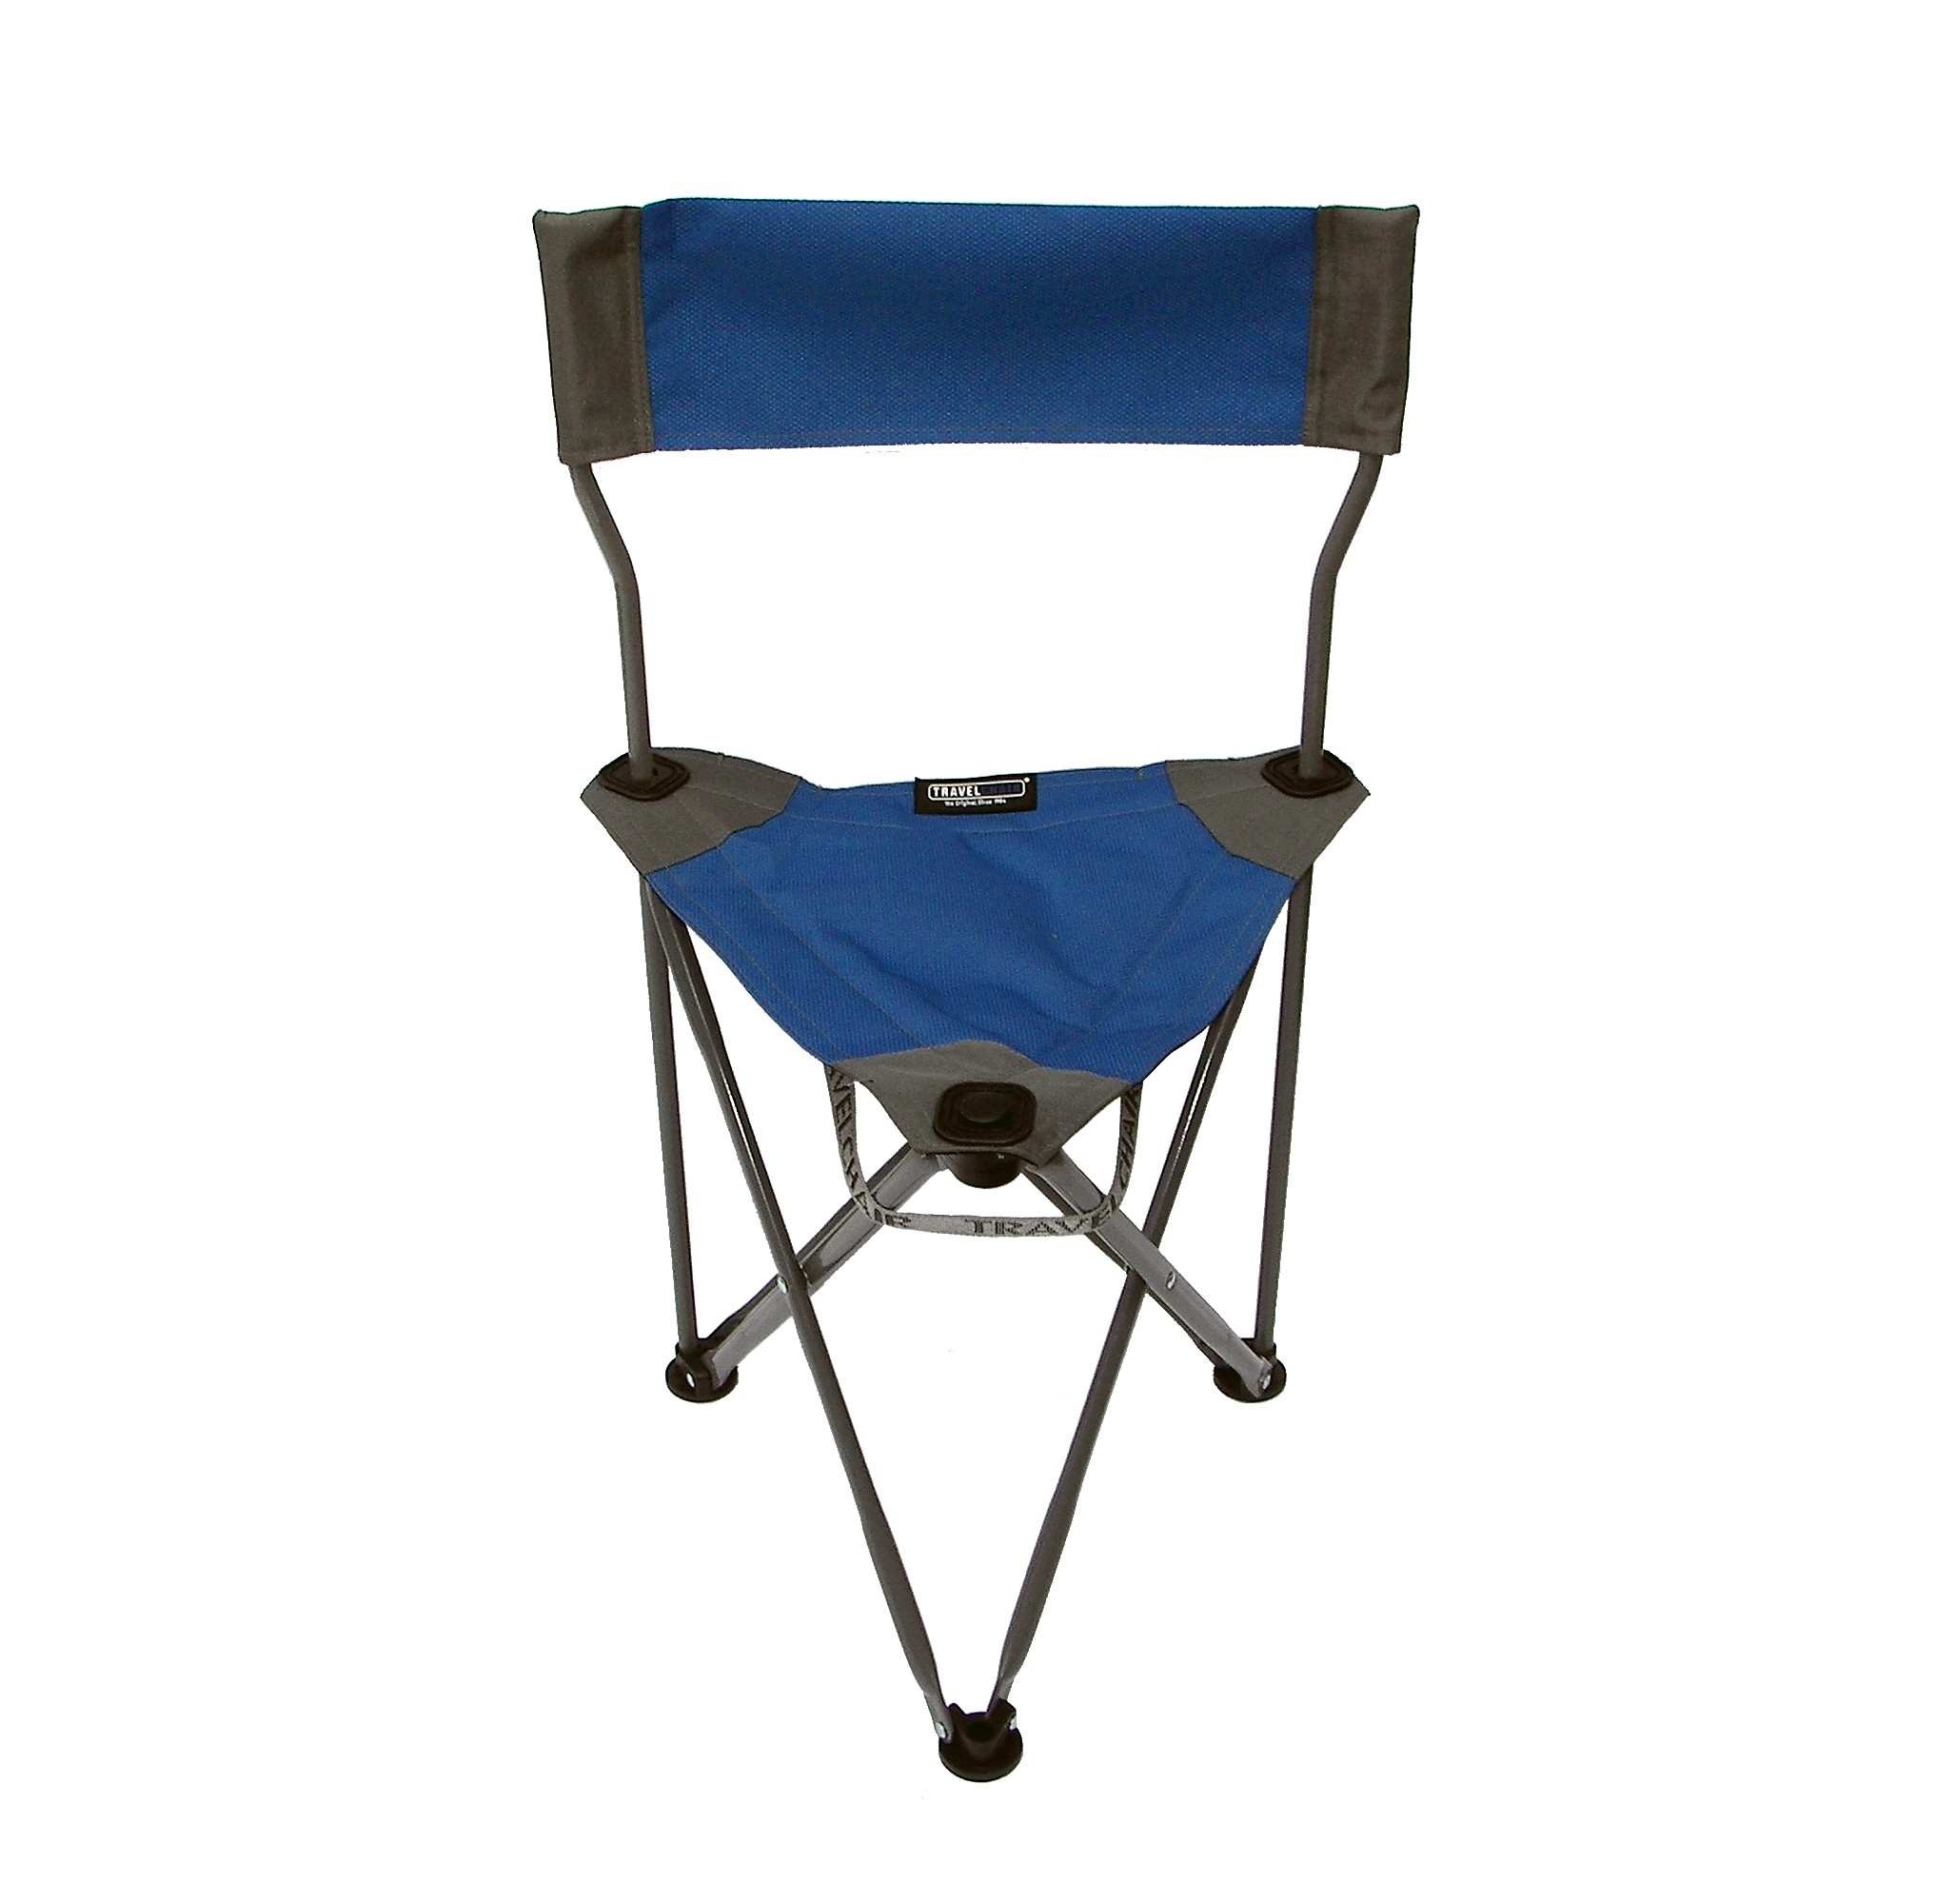 TravelChair Ultimate Slacker 20 1489V2 Portable Camping Stool